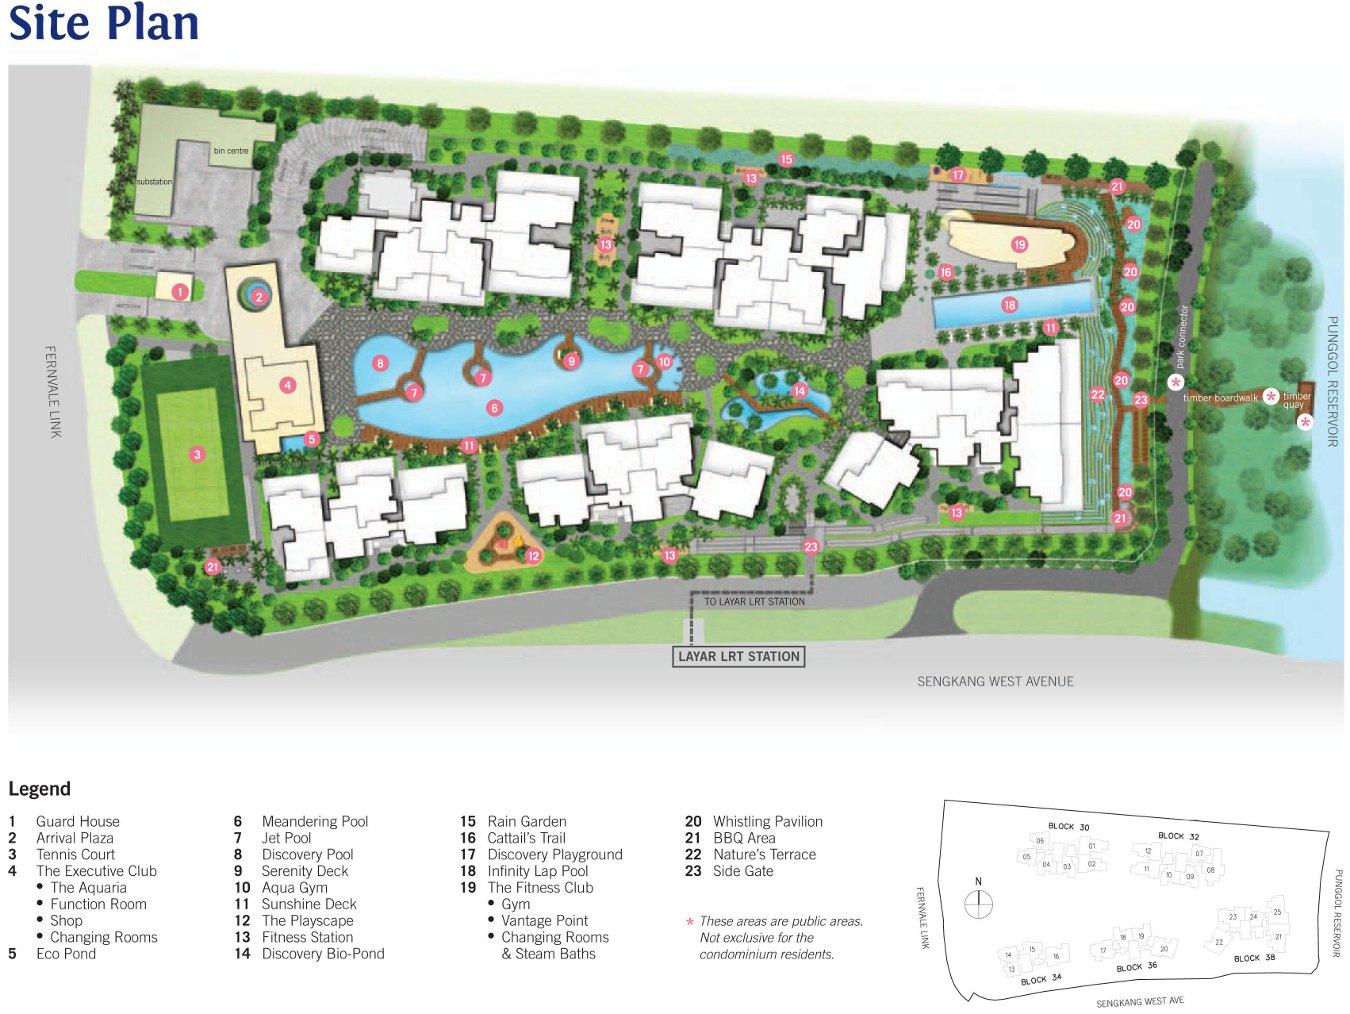 H2O Residences Site Plan